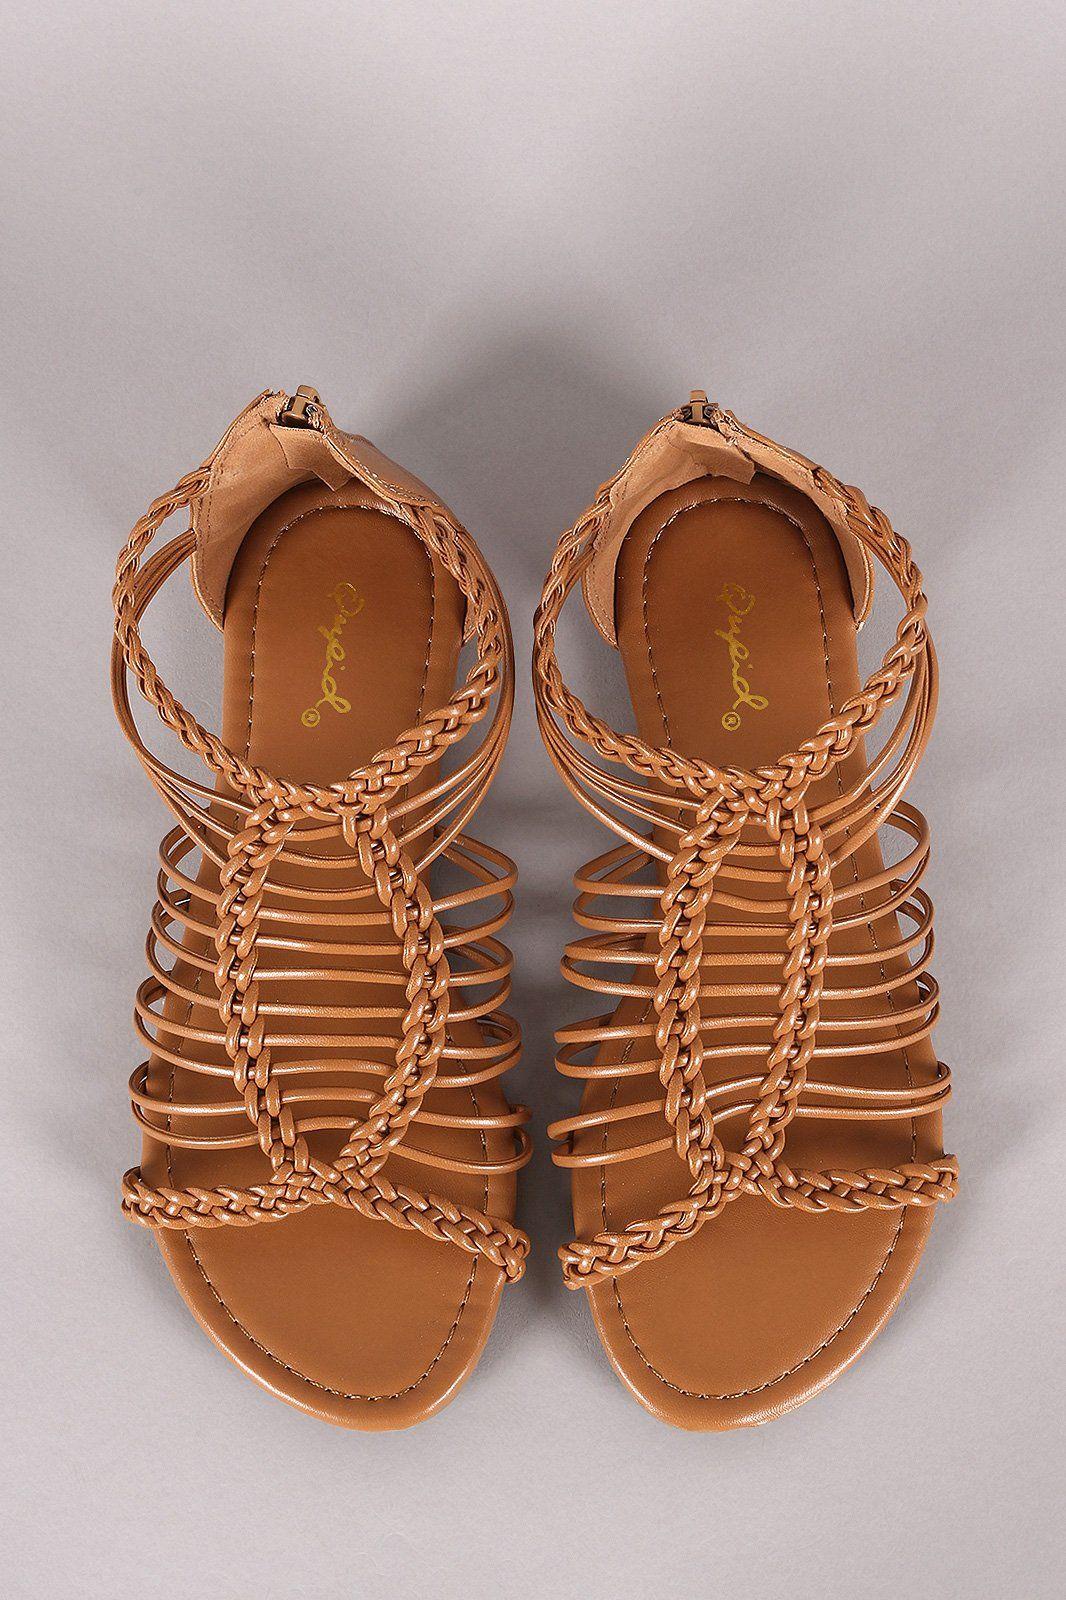 c6f70c690750 Qupid Braided Woven Gladiator Flat Sandals